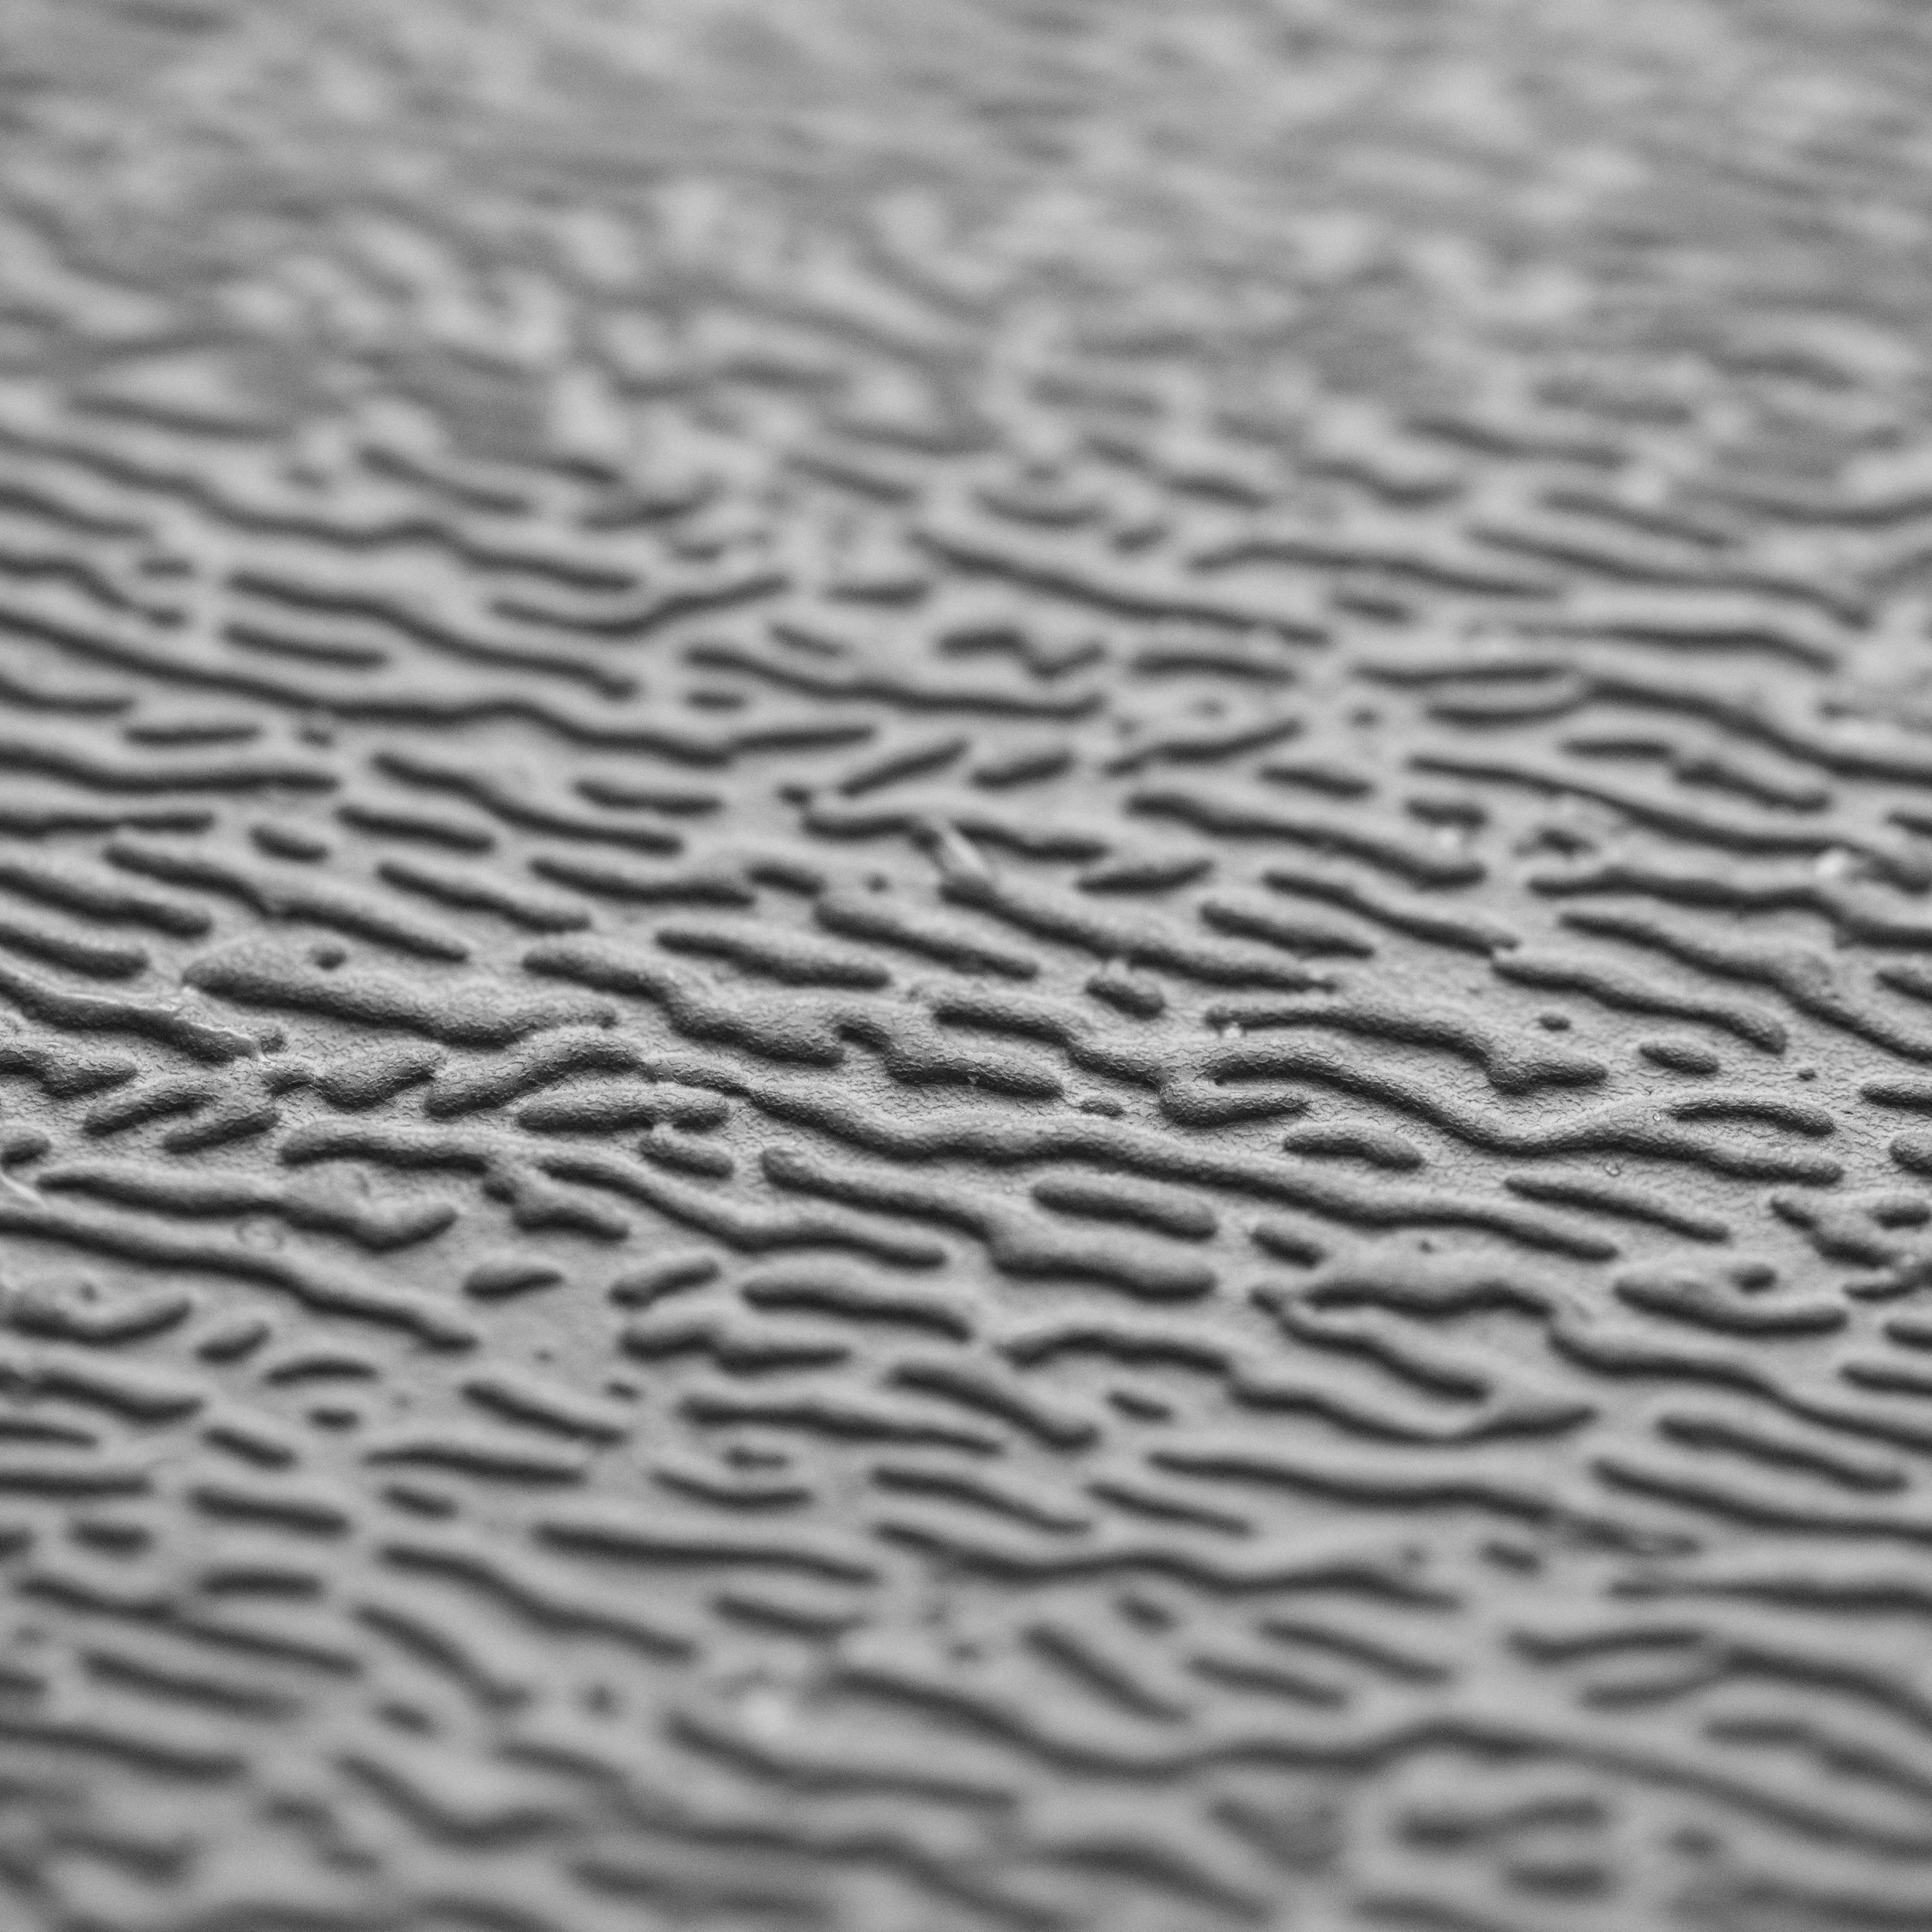 Ripple Texture.jpg